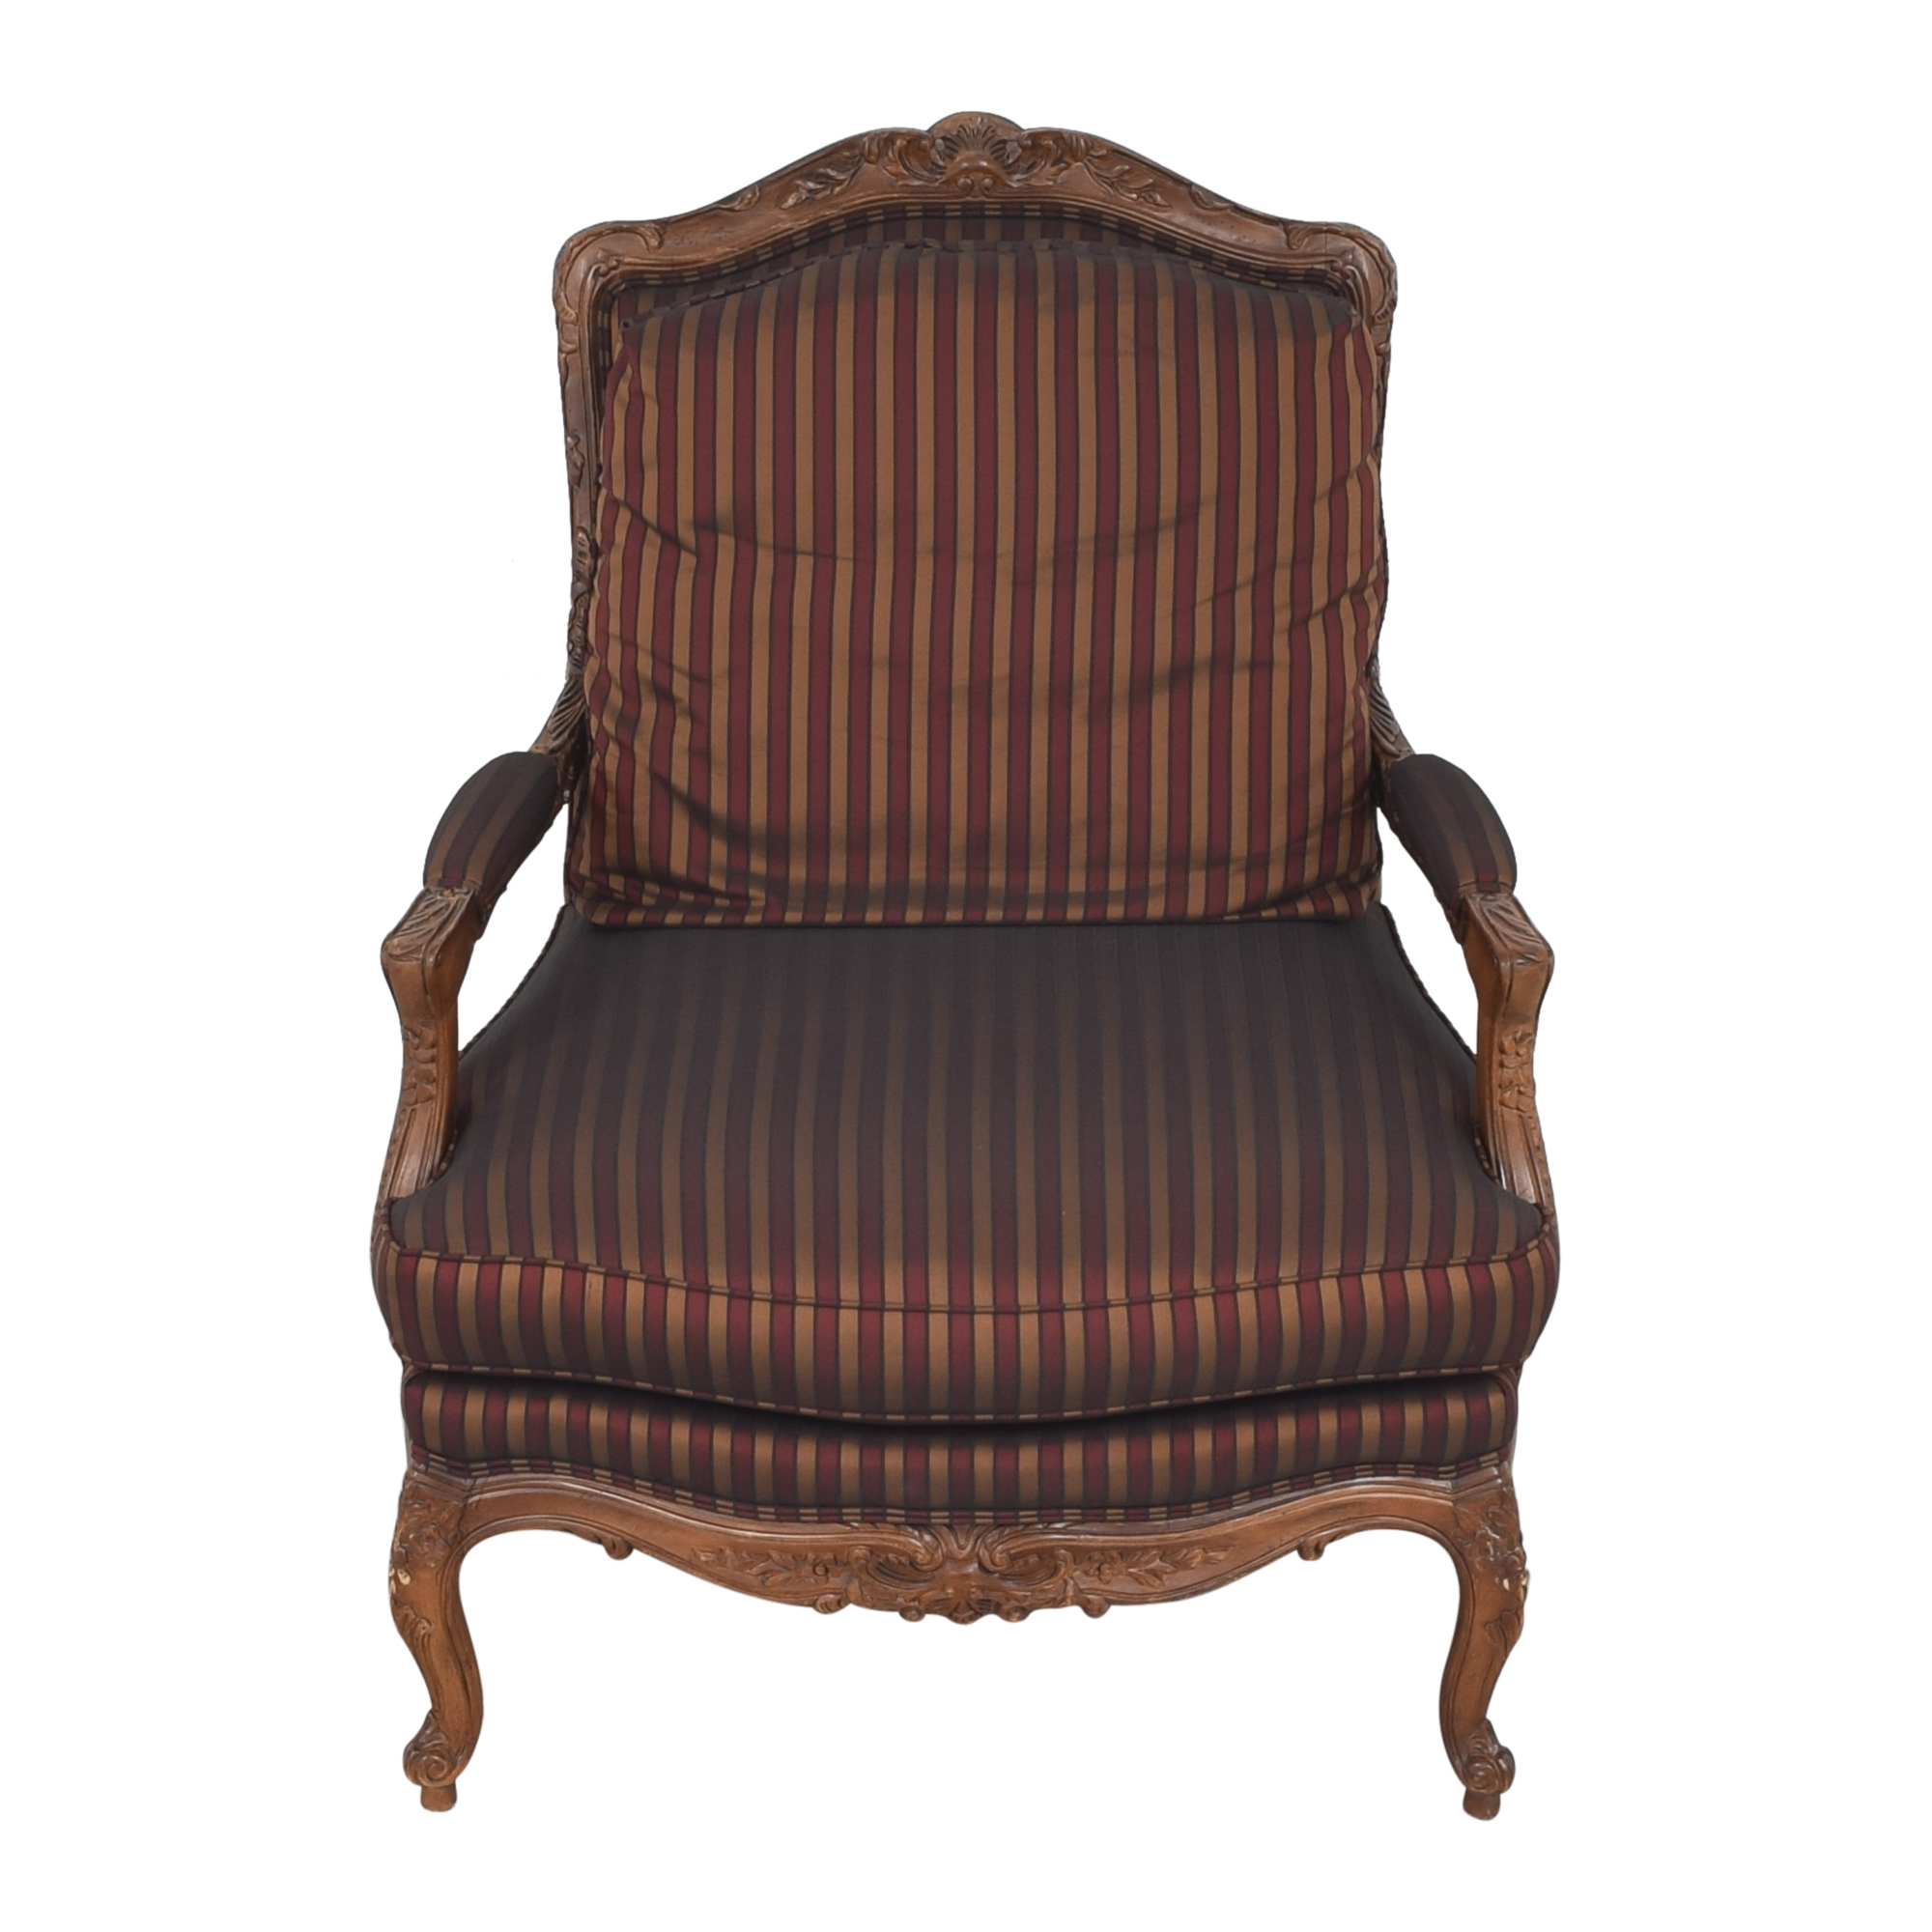 Sherrill Furniture Sherrill Furniture Bergere Style Chair brown & dark red